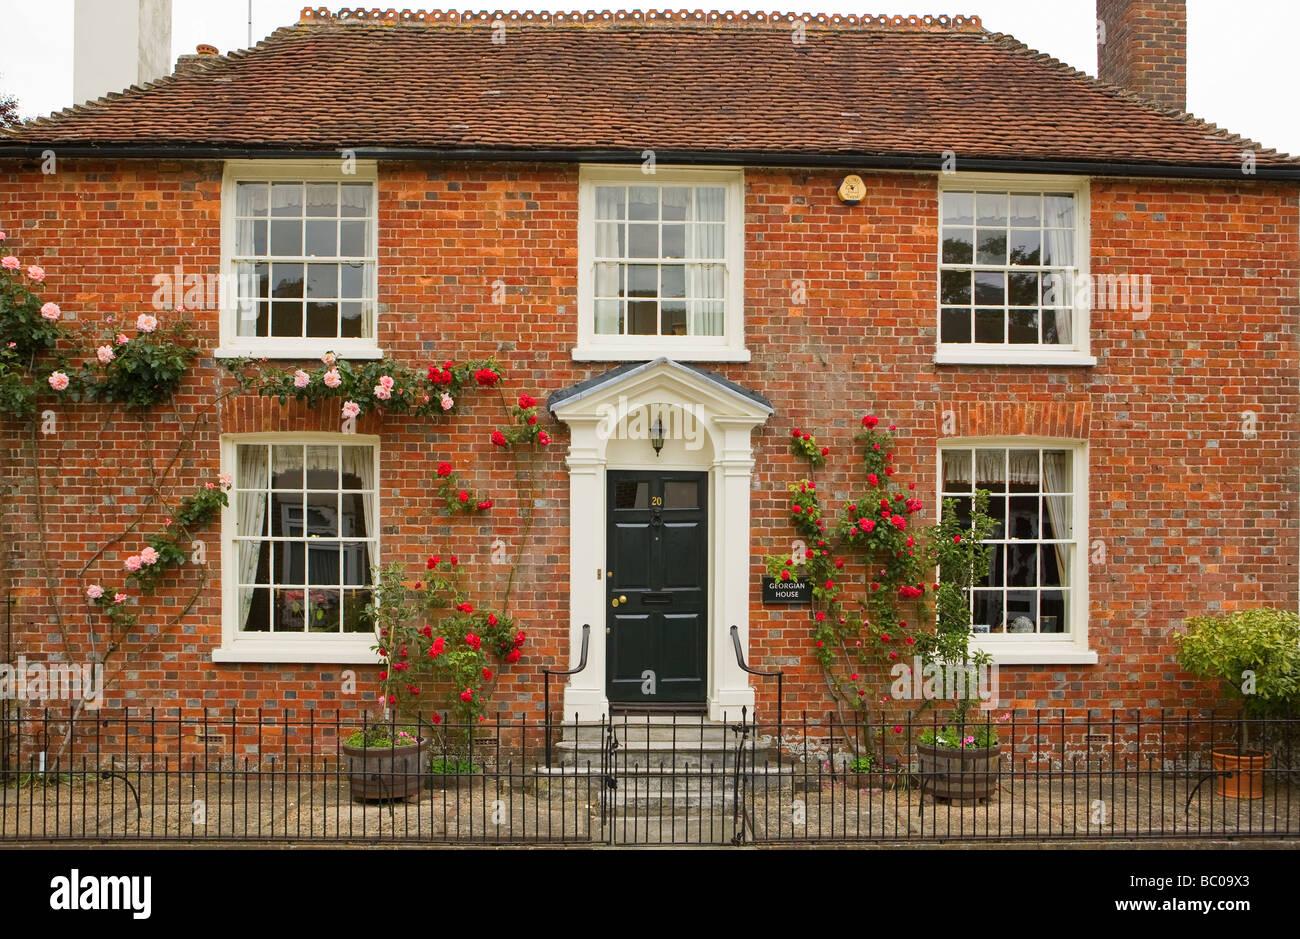 Georgian town house. Storrington, West Sussex, UK - Stock Image